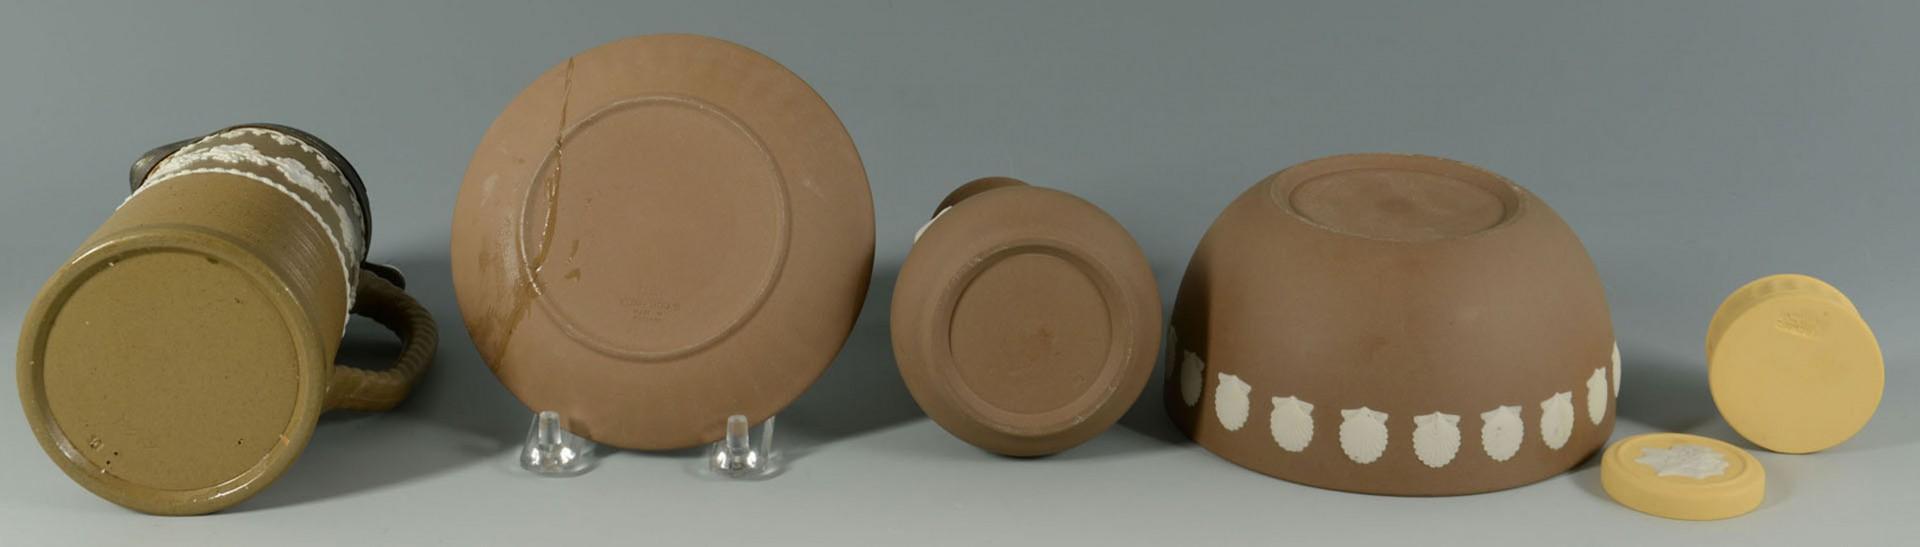 Lot 2872336: Lot of 19th c. English ceramics: lustre, creamware